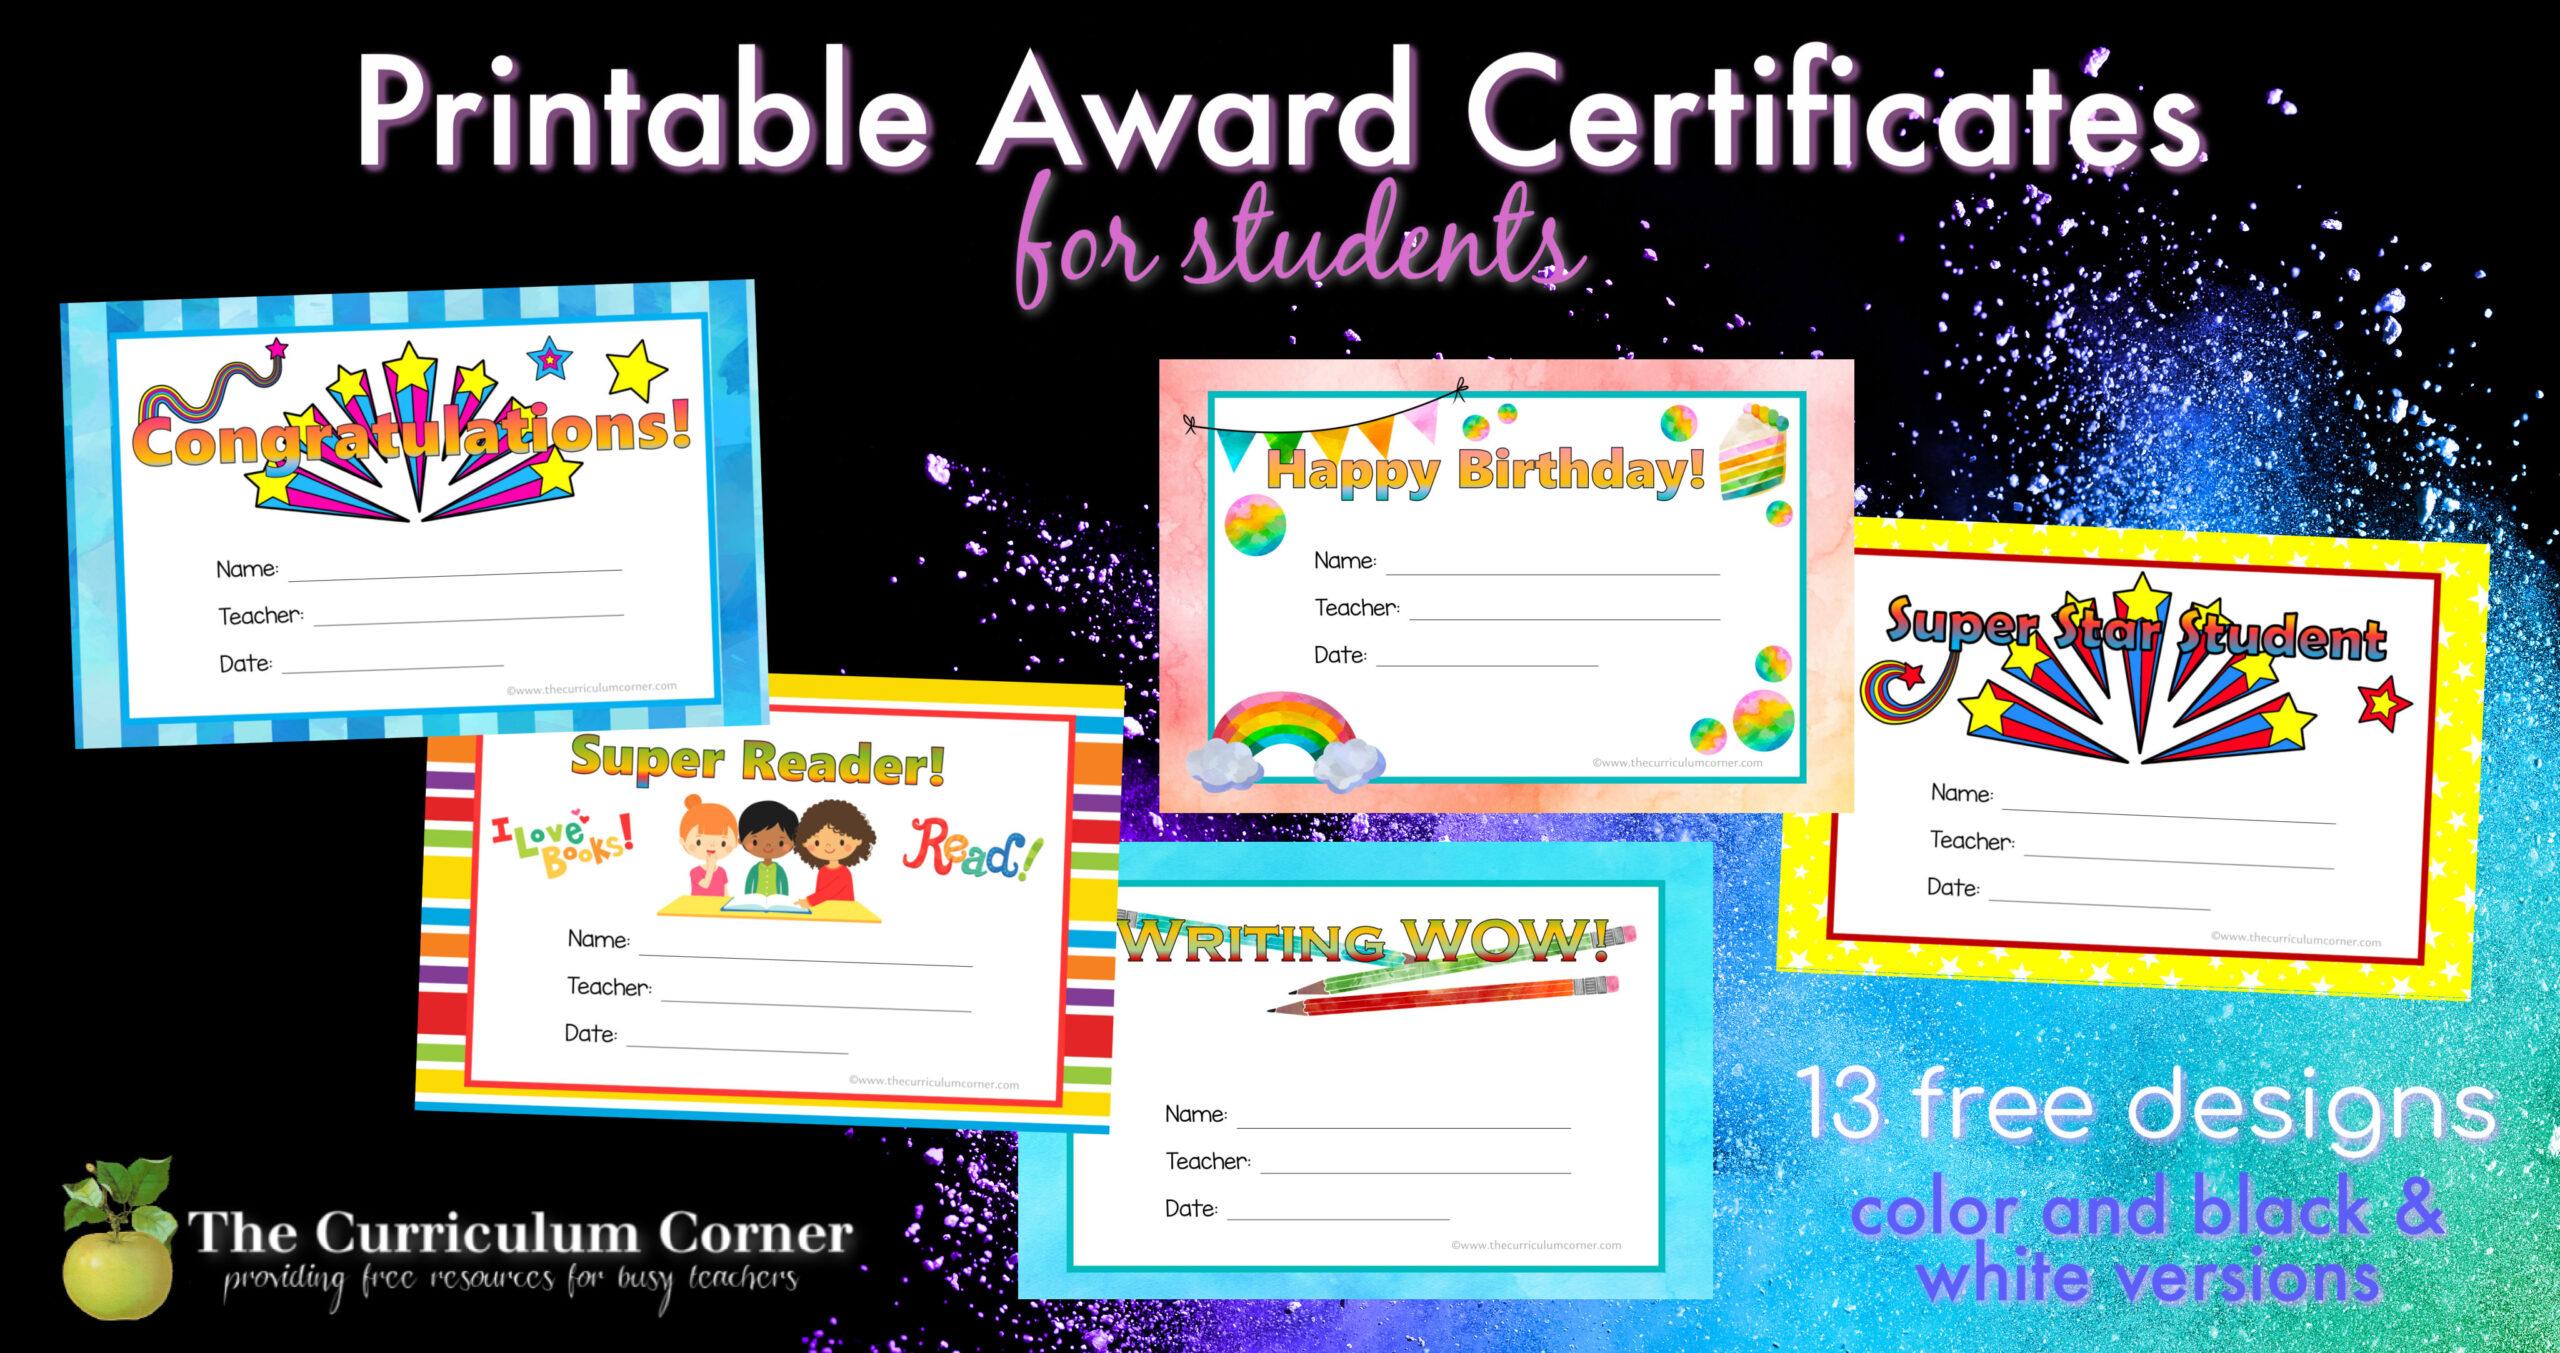 Printable Award Certificates The Curriculum Corner 123